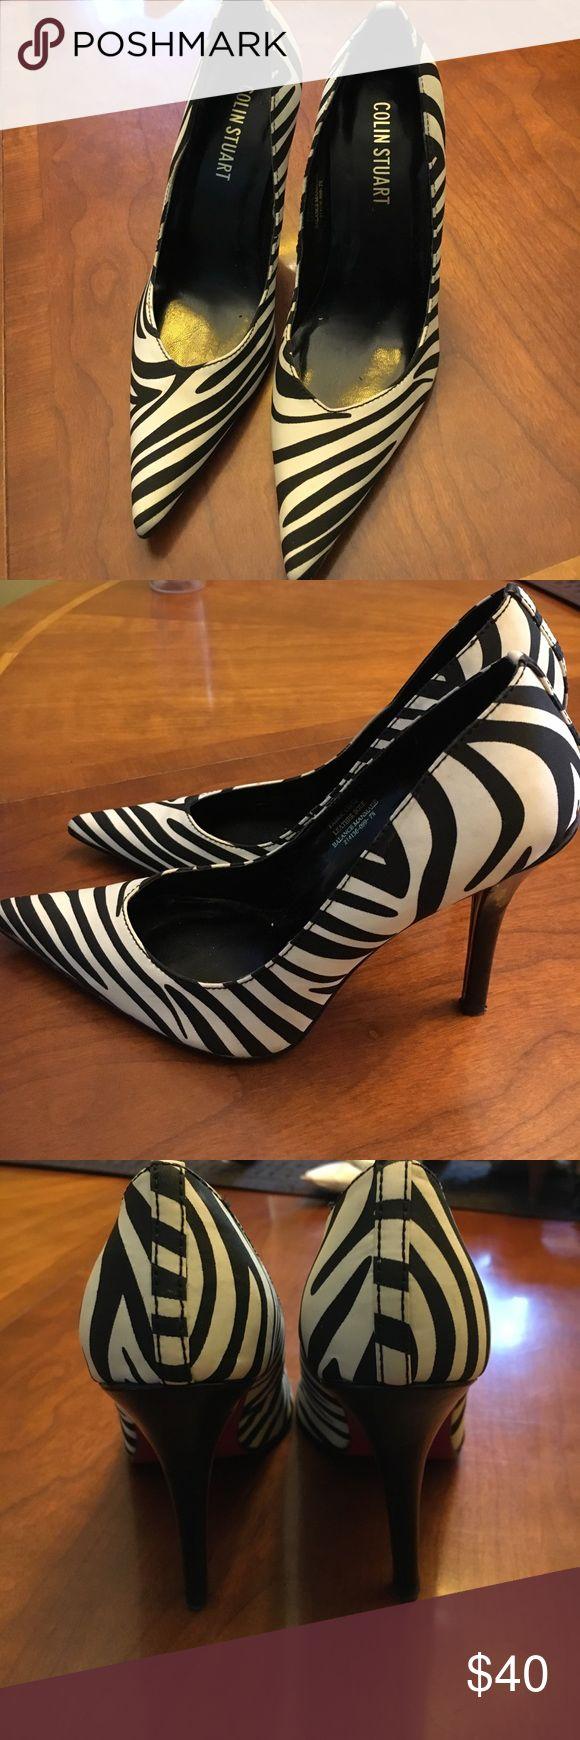 Colin Stuart Zebra Heels Only worn once. Excellent condition! Colin Stuart Shoes Heels